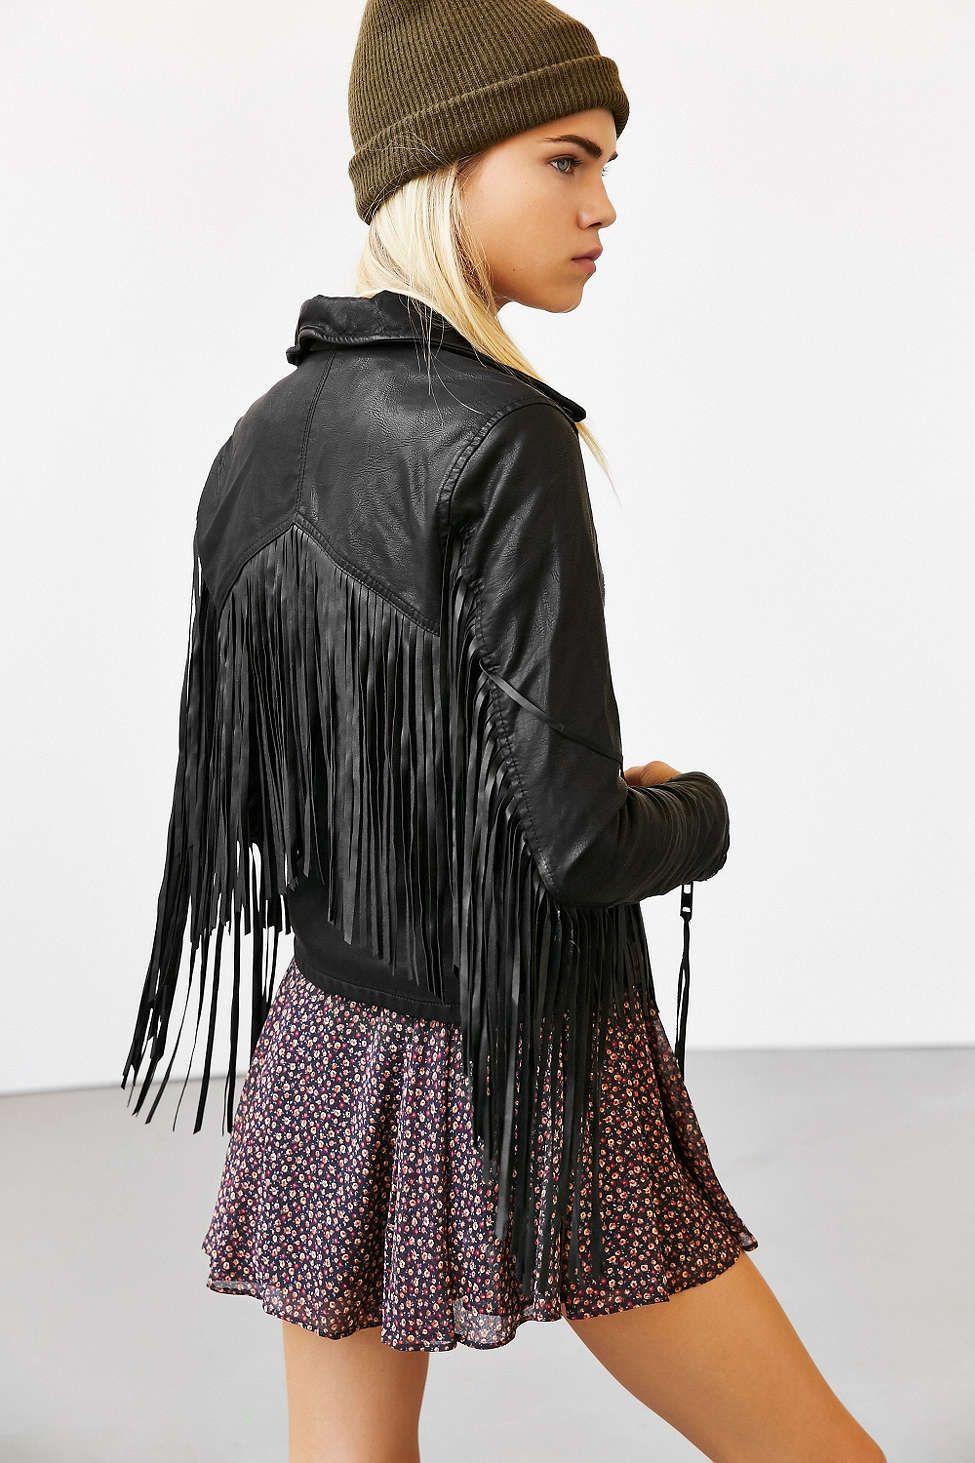 59f8d5b33d20 BLANKNYC Vegan Leather Fringe Jacket - Urban Outfitters | Wishlist ...